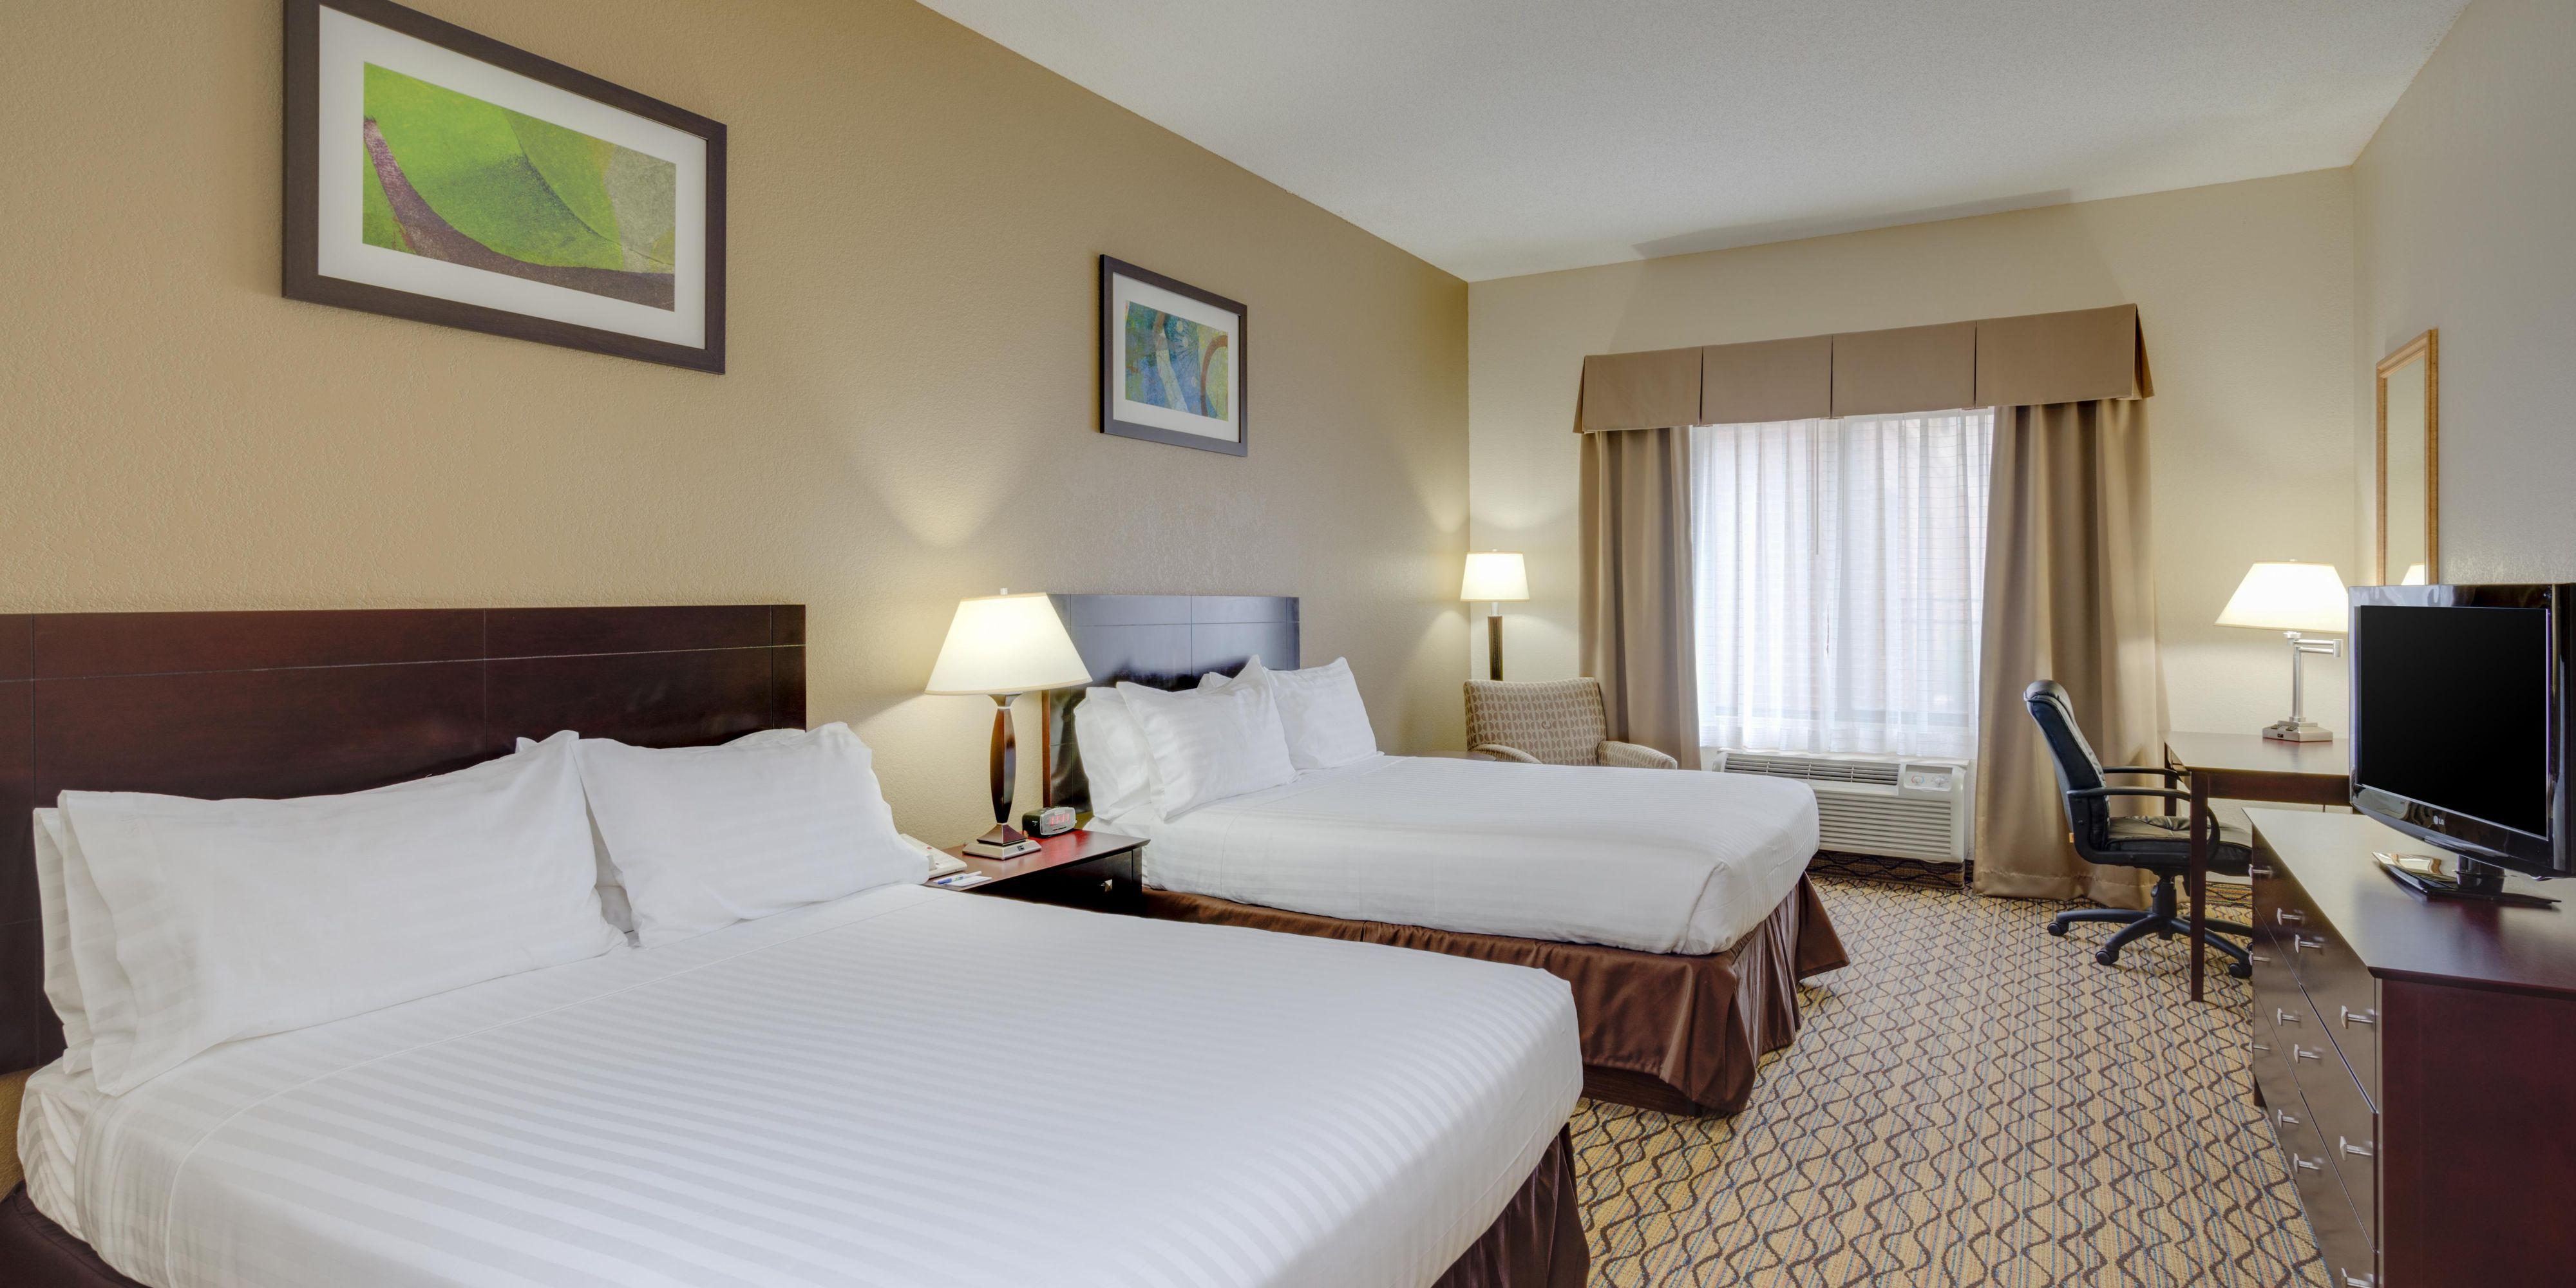 Holiday Inn Express Ranson 4510724135 2x1